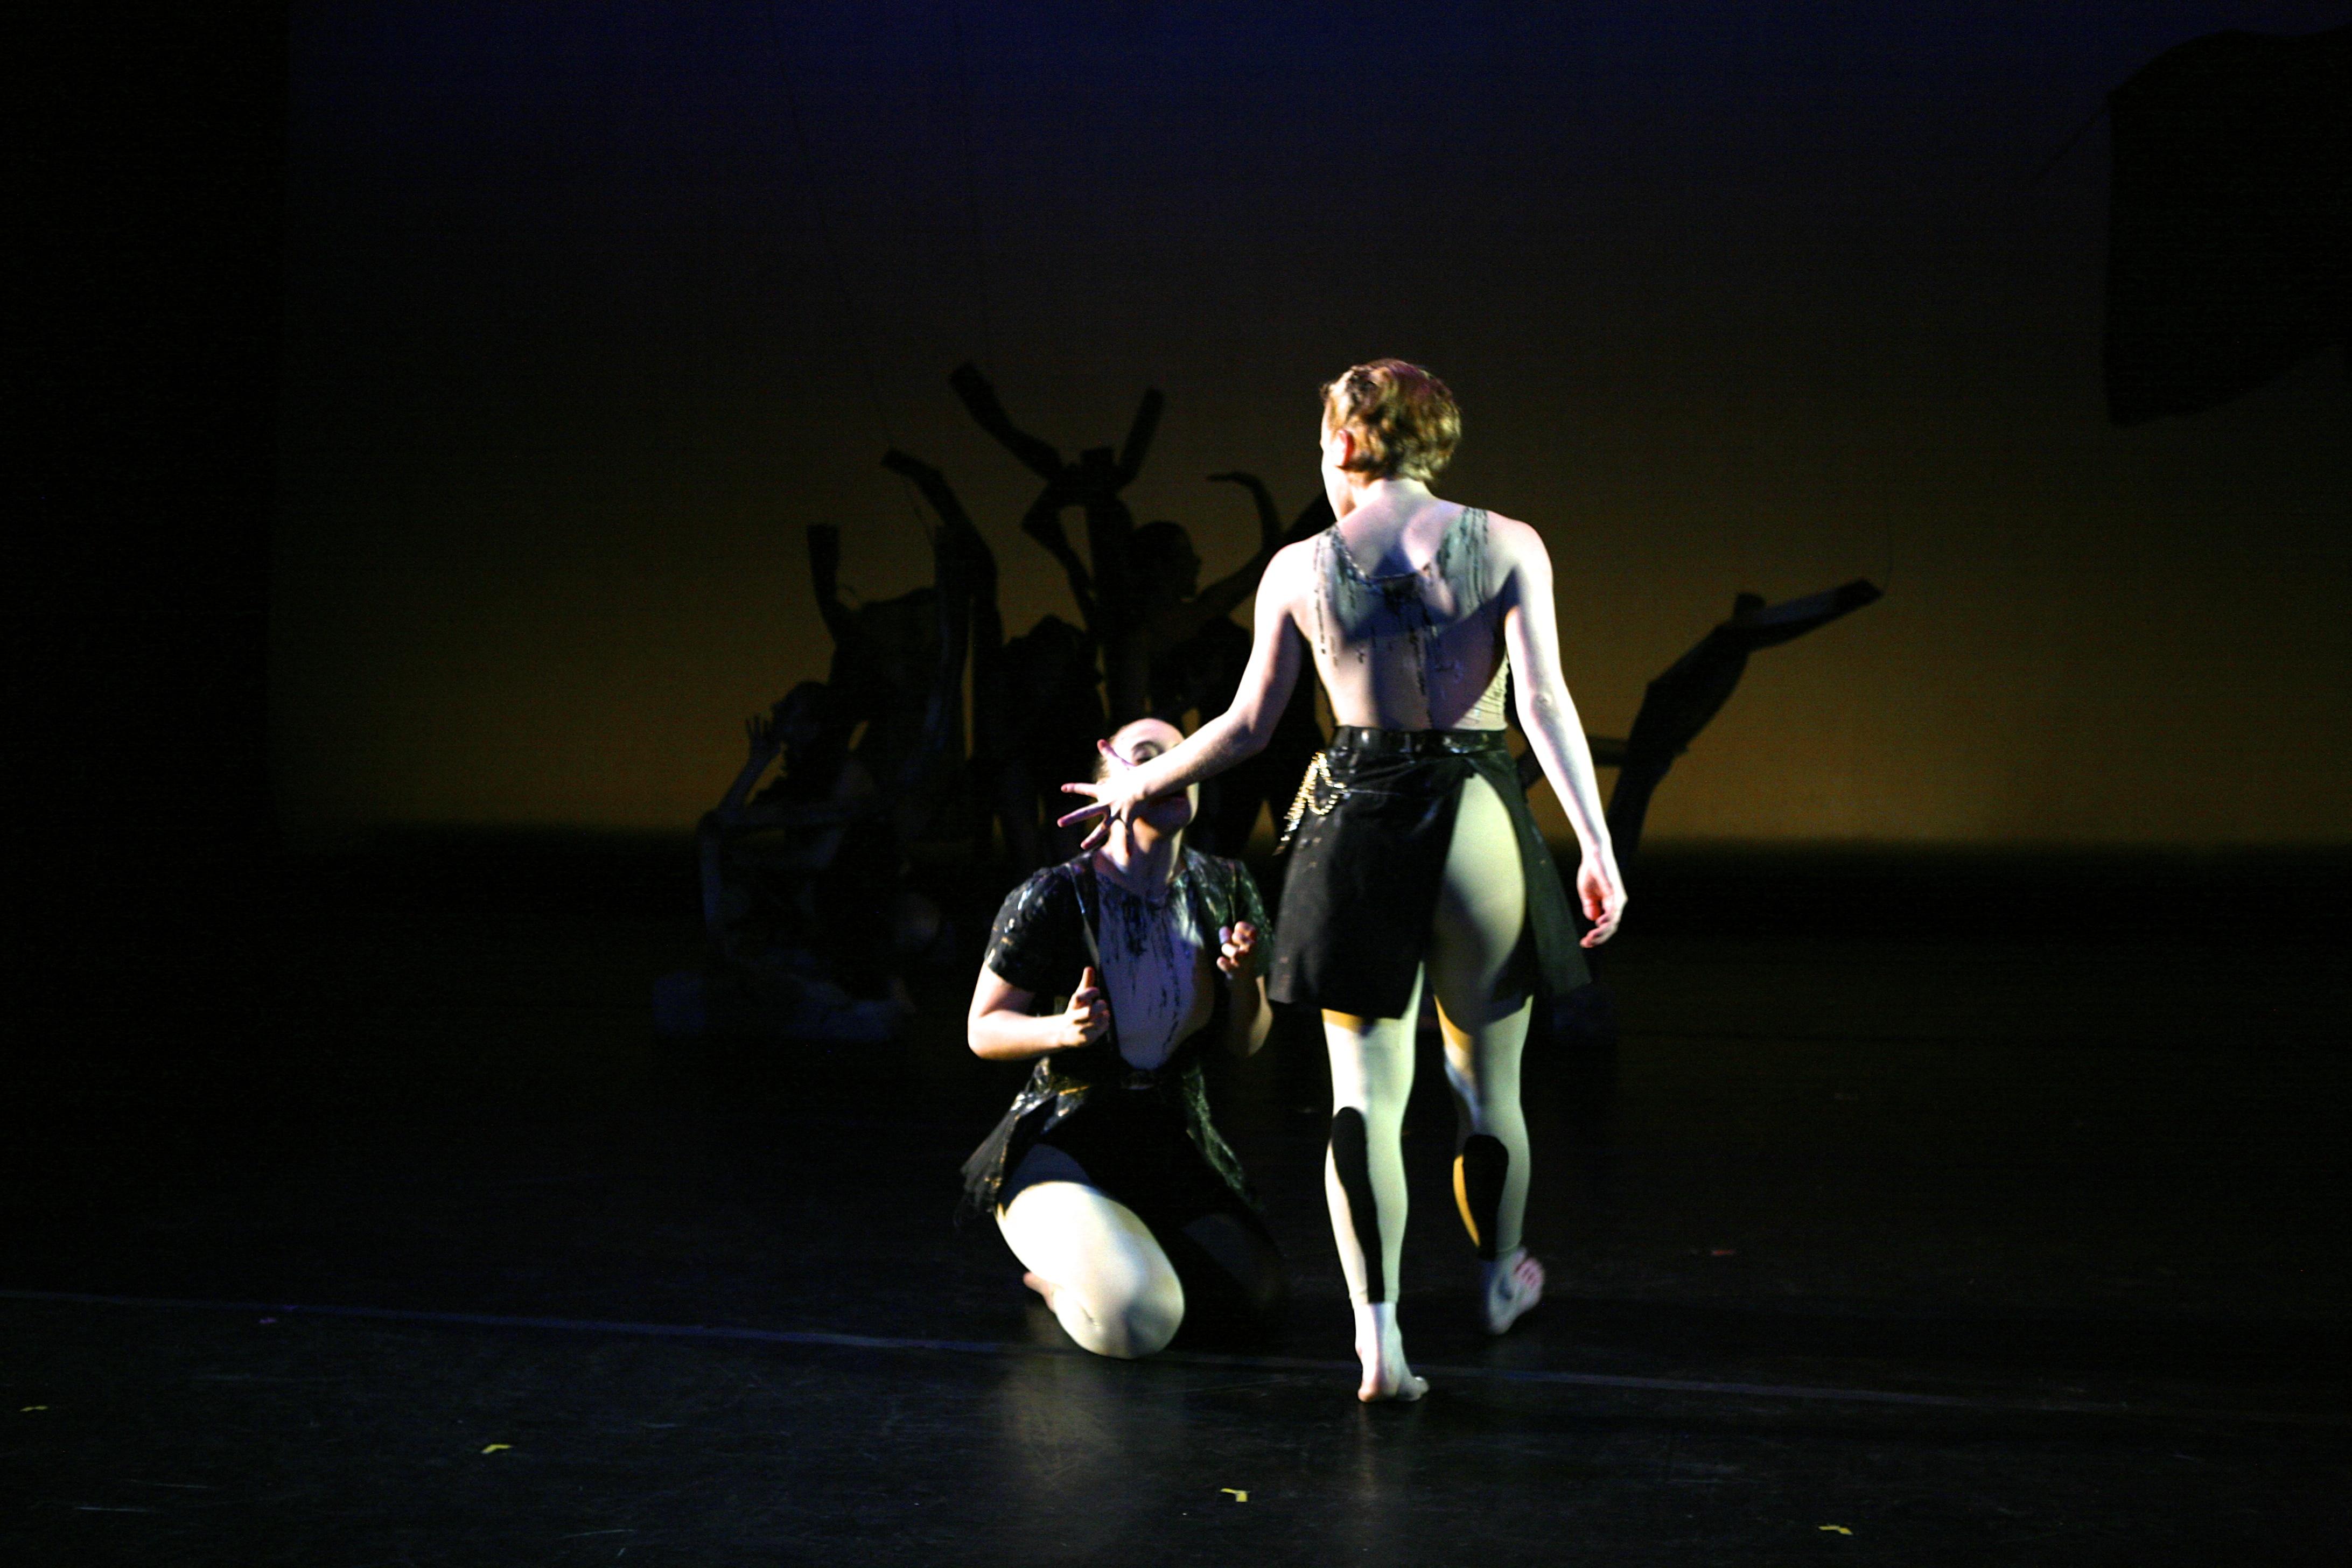 Tamara_Design_Scrap_Dance_NYU_5